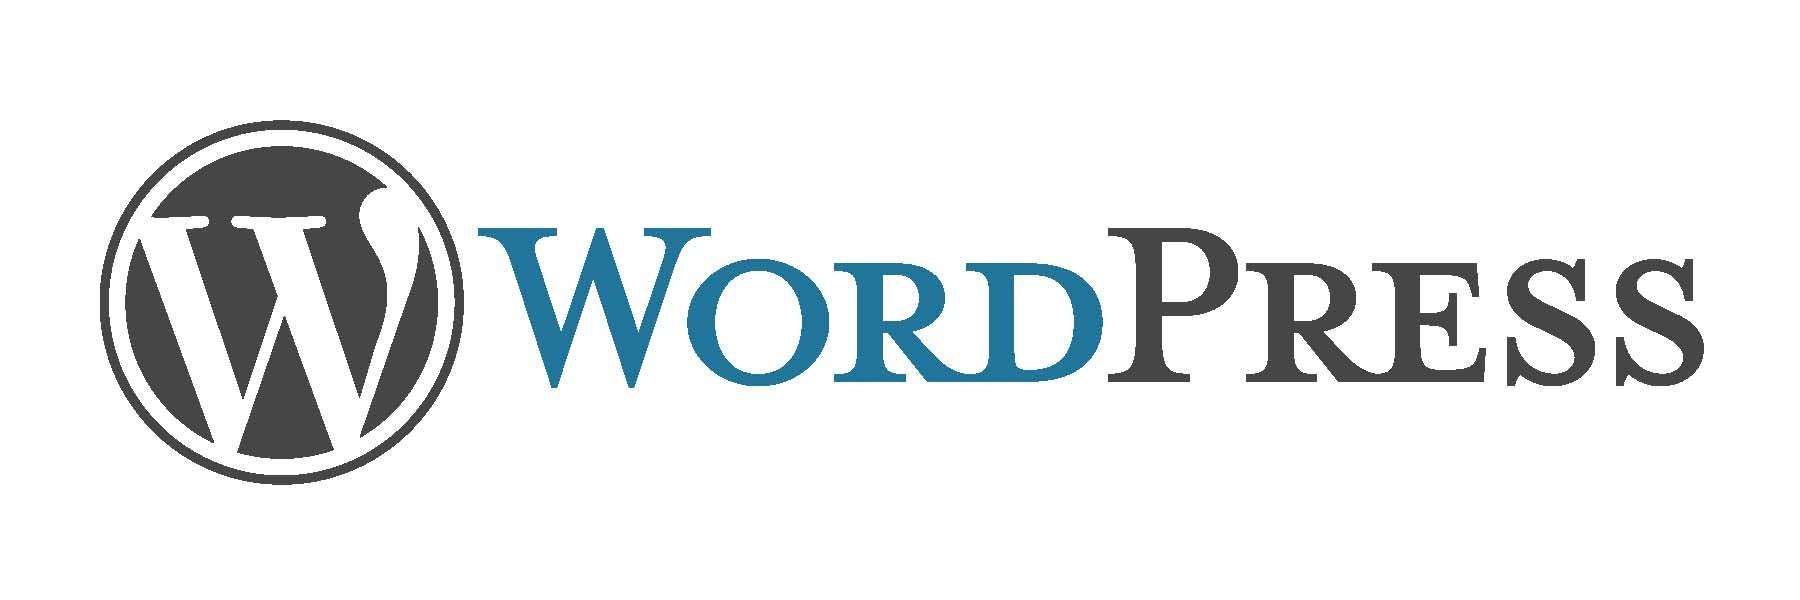 Centralized post for WordPress development post thumbnail image